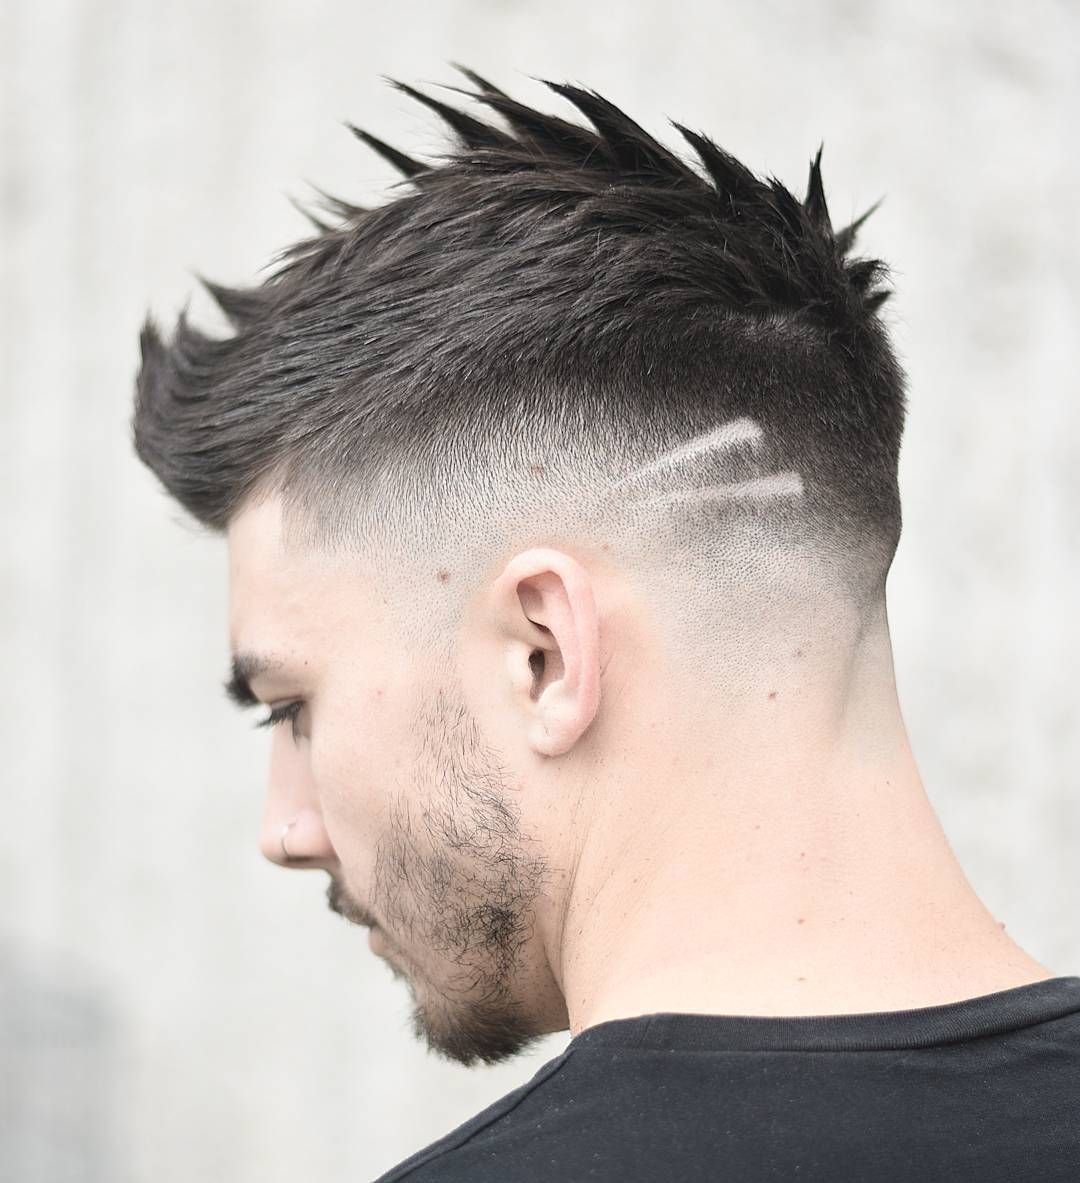 European Haircut Trends For Men | Haircuts for men, Cool ...